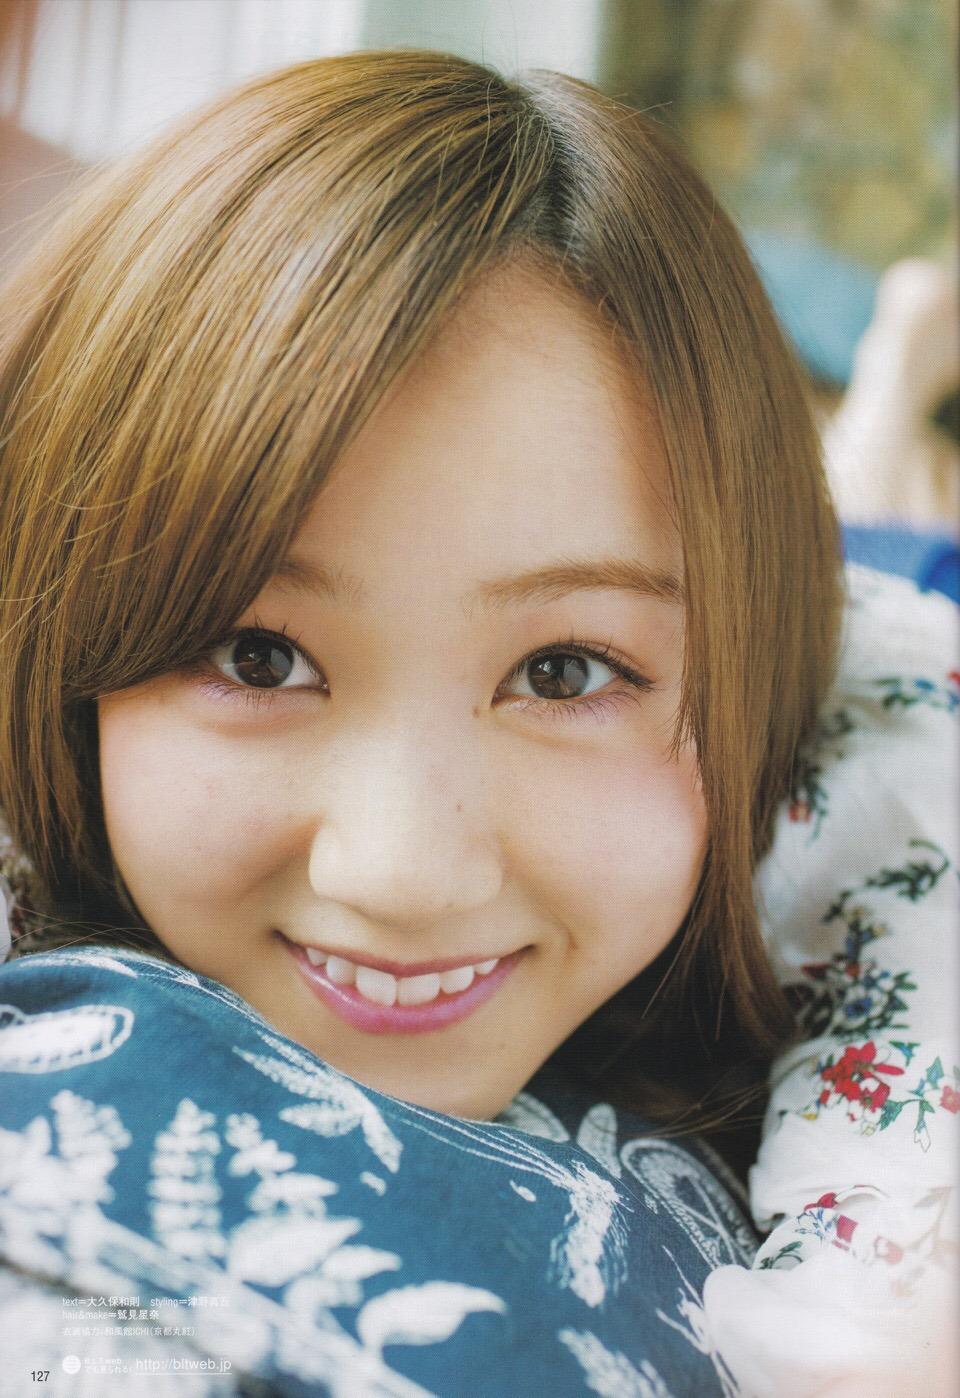 Hoshino Minami 星野みなみ, B.L.T 2017年10月号